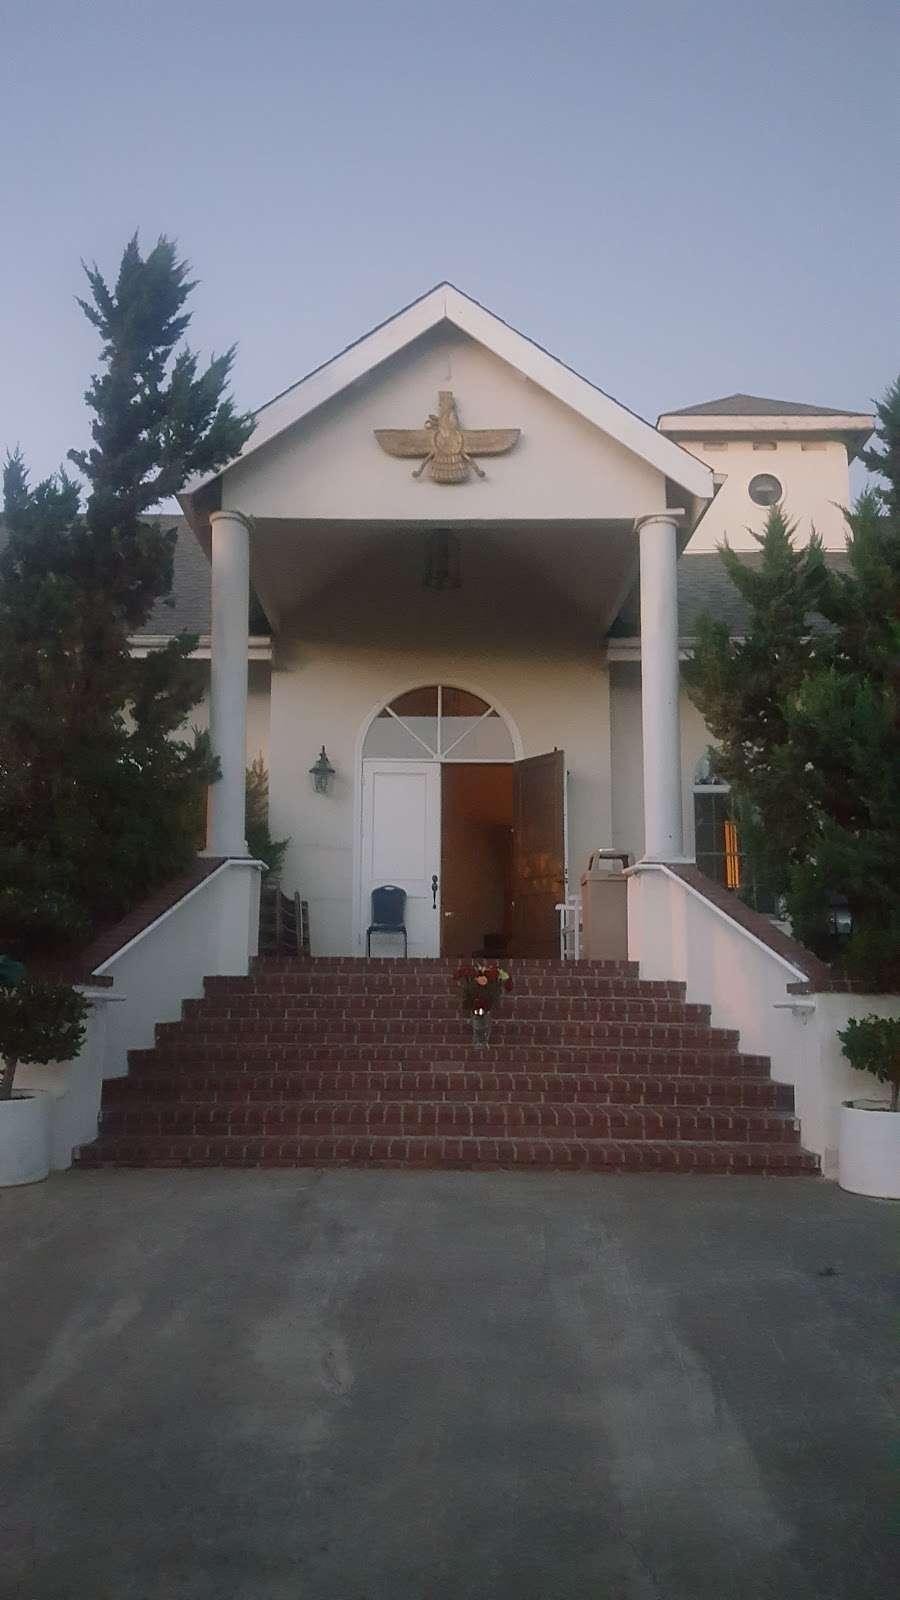 Zoroastrian Temple - church  | Photo 2 of 10 | Address: 10468 Crothers Rd, San Jose, CA 95127, USA | Phone: (408) 272-1678